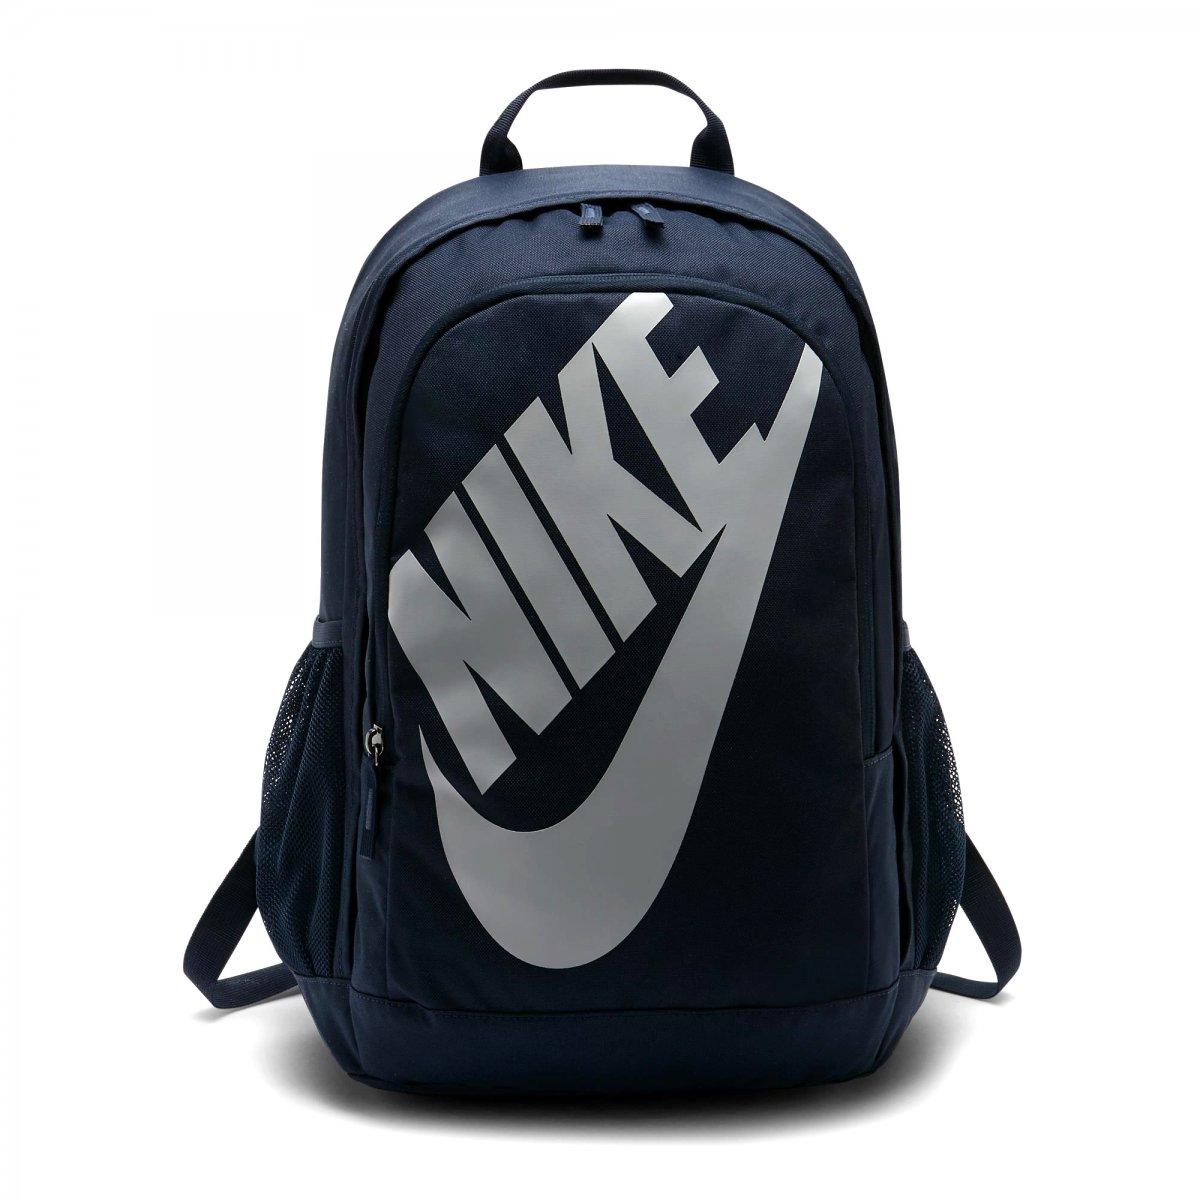 ba1c3baf6a Mochila Nike Hayward Futura 2.0 BA5217-451 - Marinho - Botas Online ...